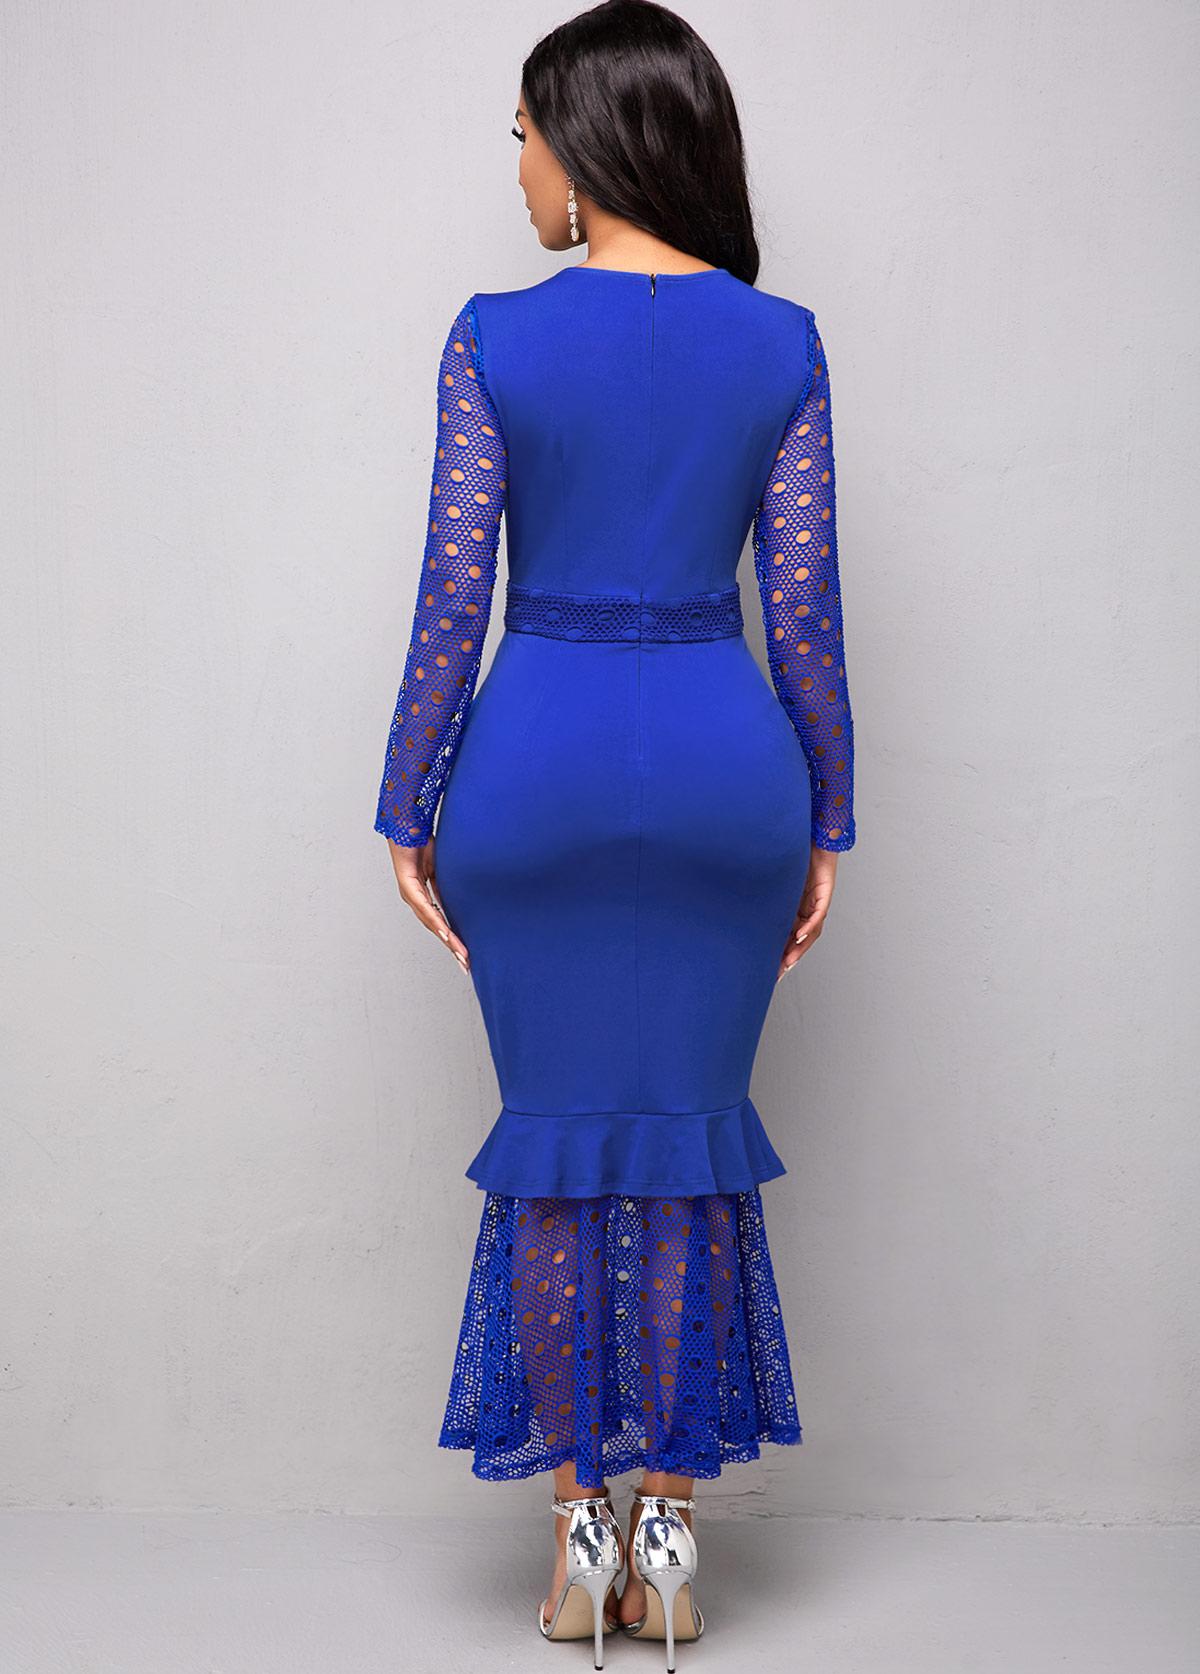 Long Sleeve Lace Stitching Round Neck Mermaid Dress